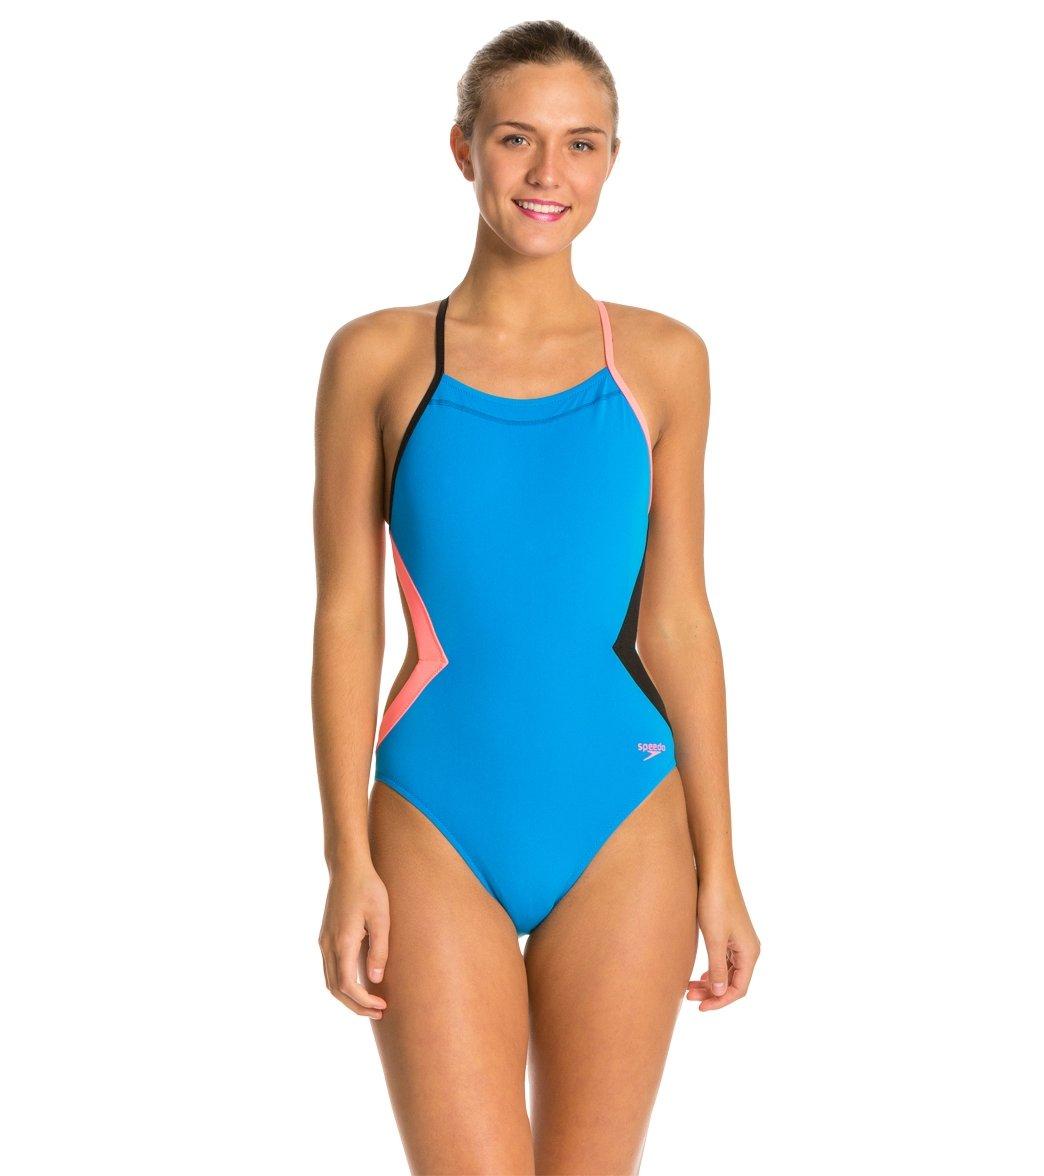 8661d0b955794 Speedo Flipturns Solid Colorblock One Piece Swimsuit at SwimOutlet ...